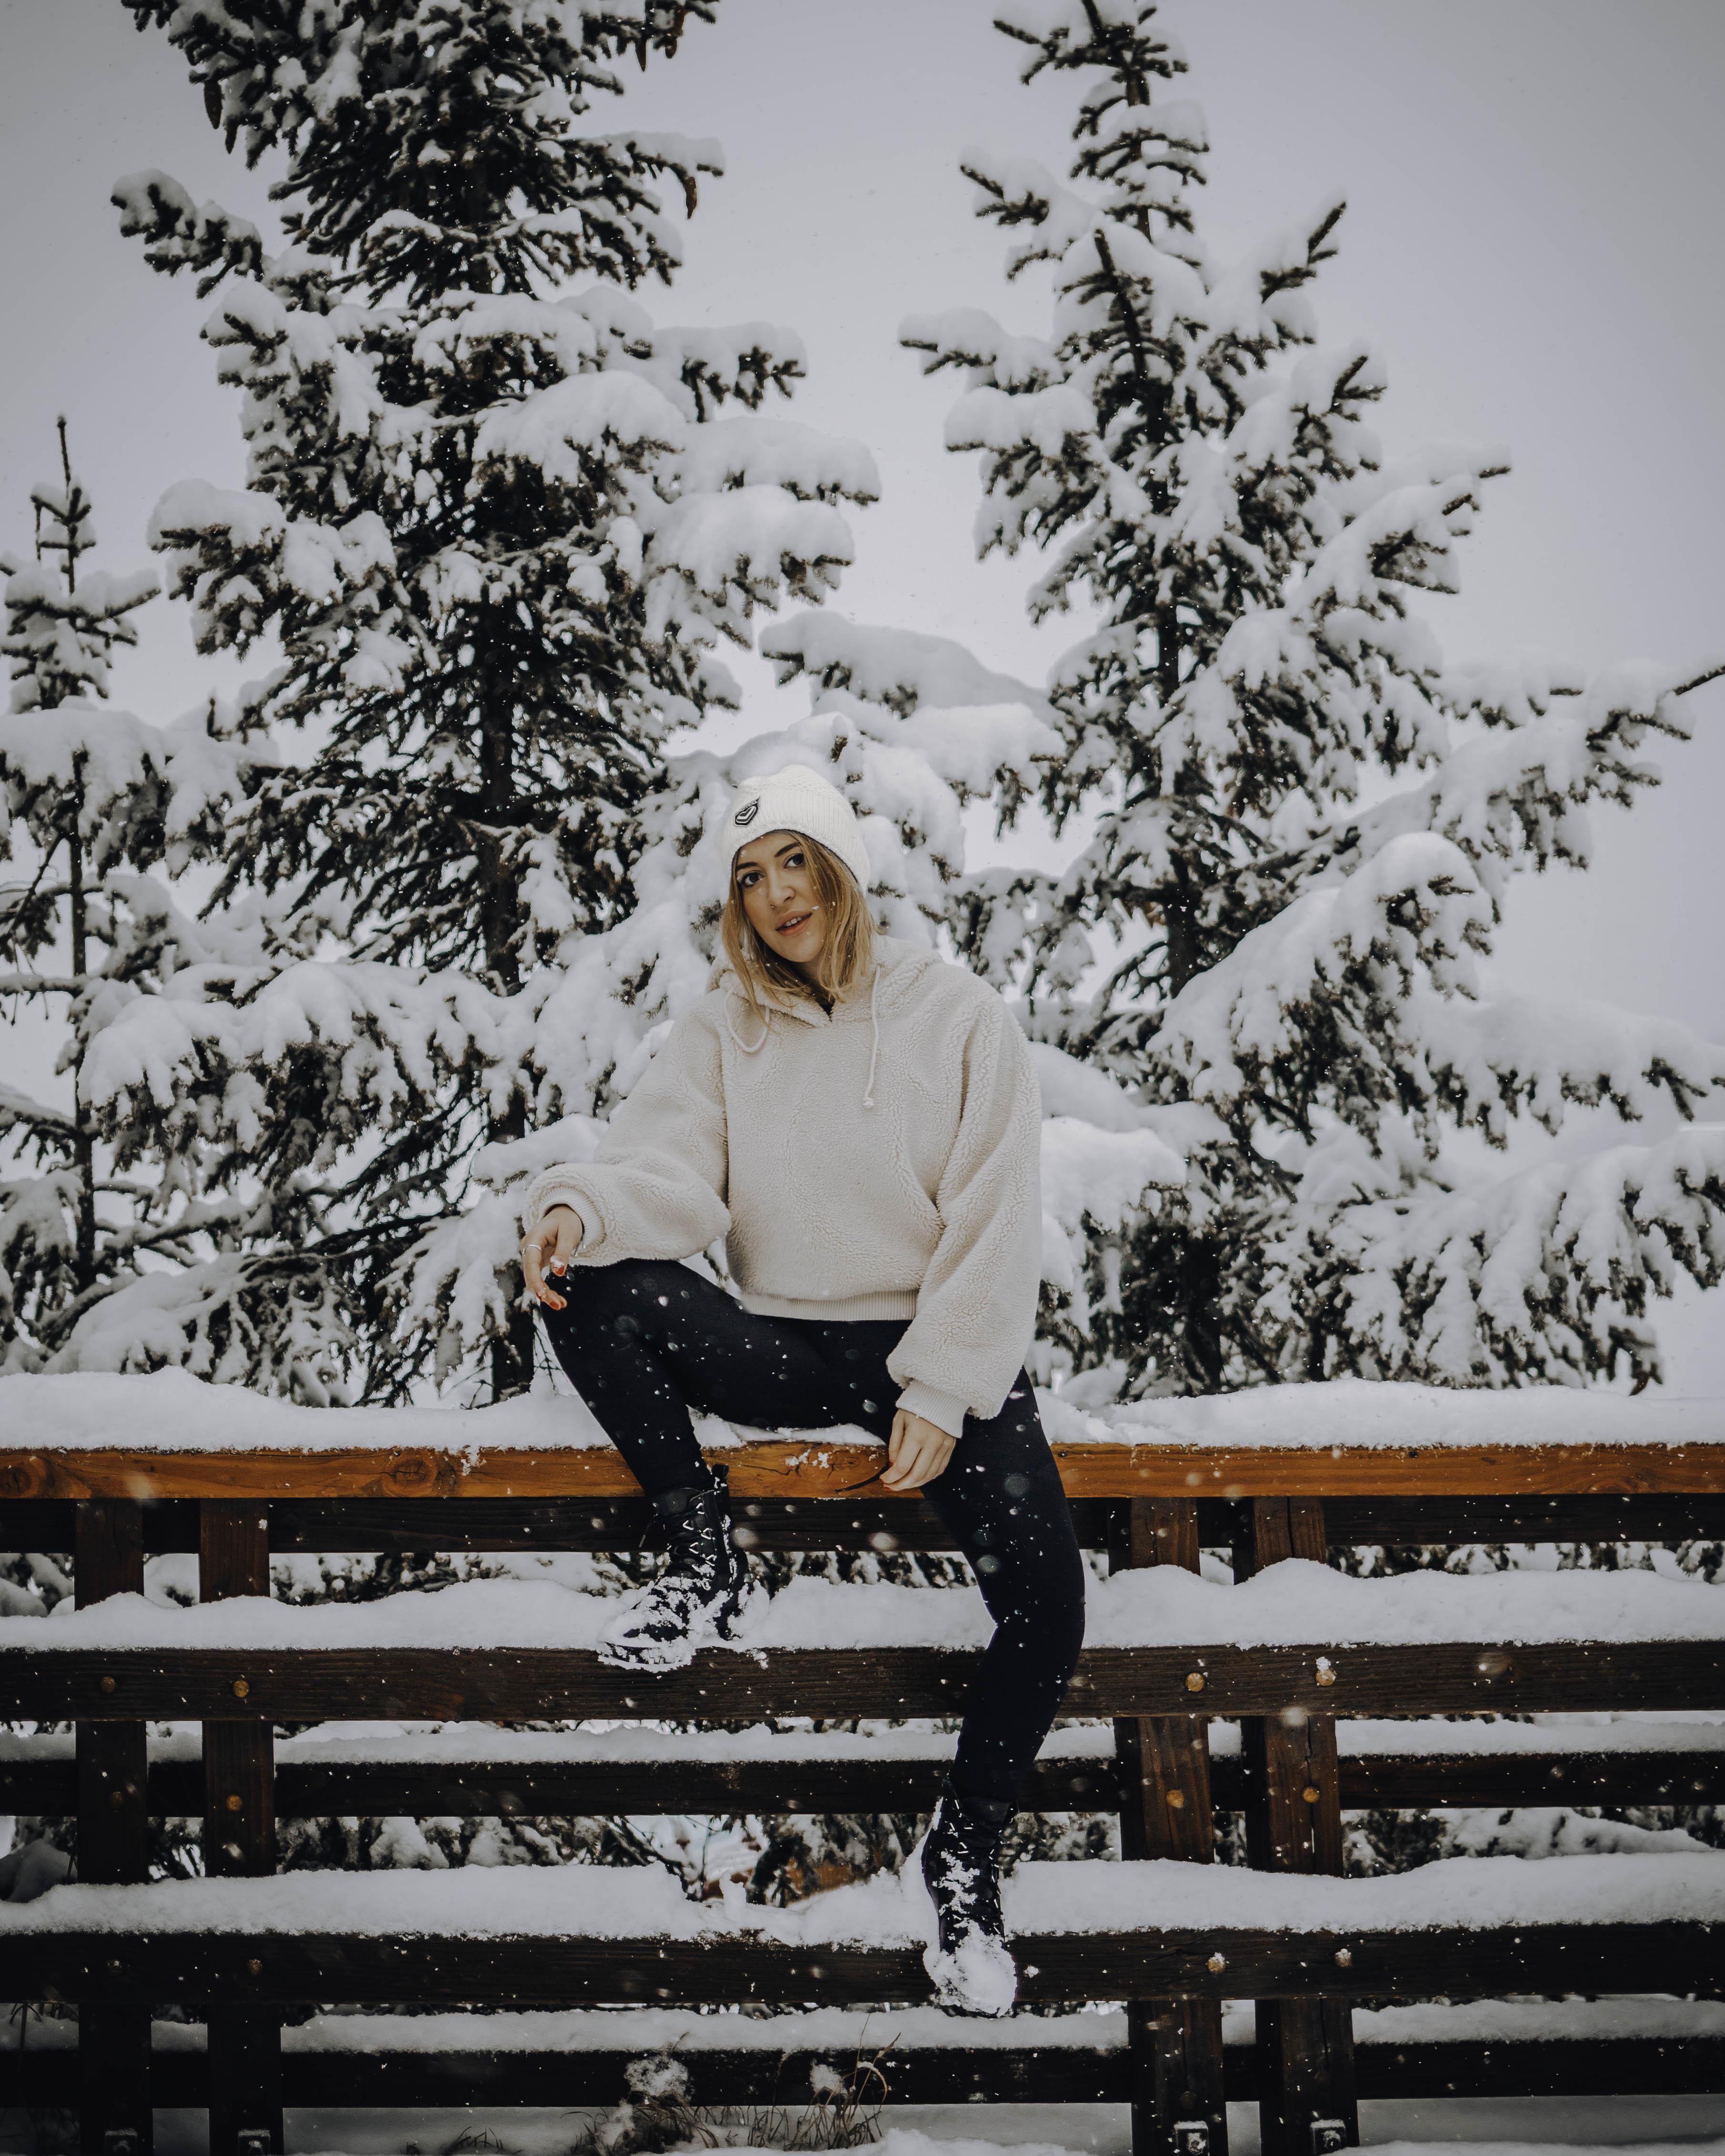 Learn to ski as an adult in Meribel